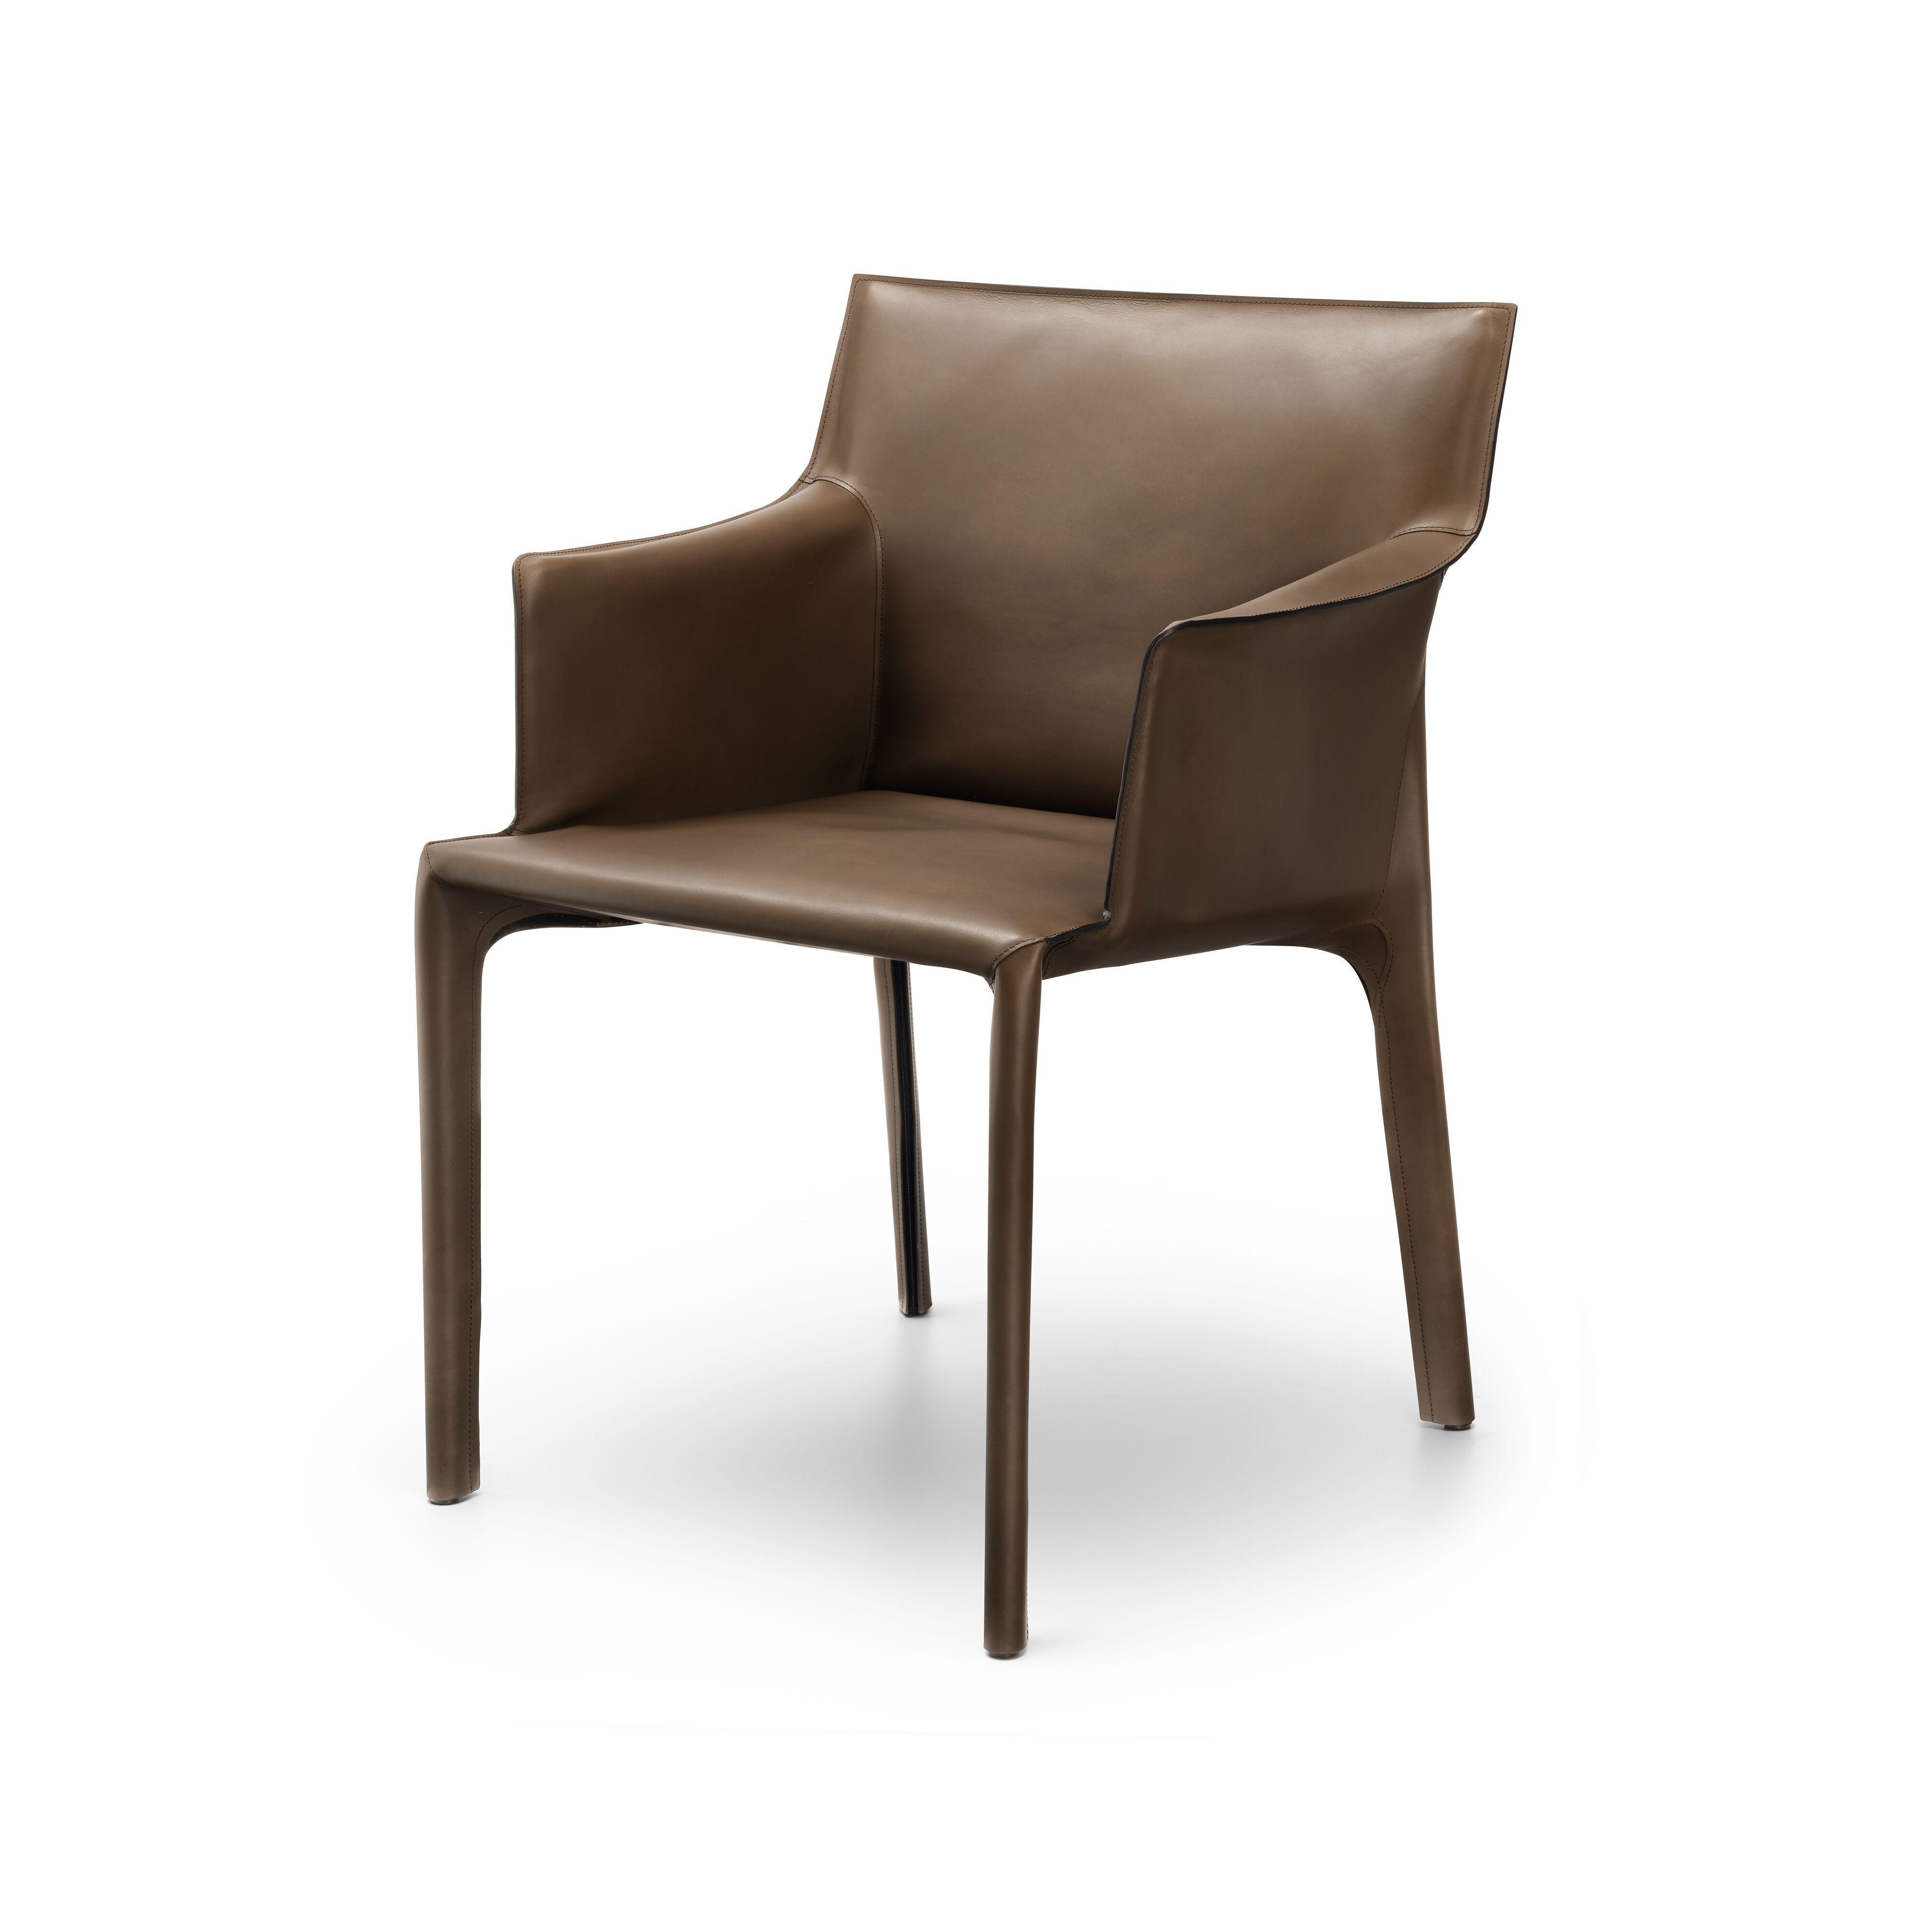 04-WK-Saddle-Chair-0023.tif